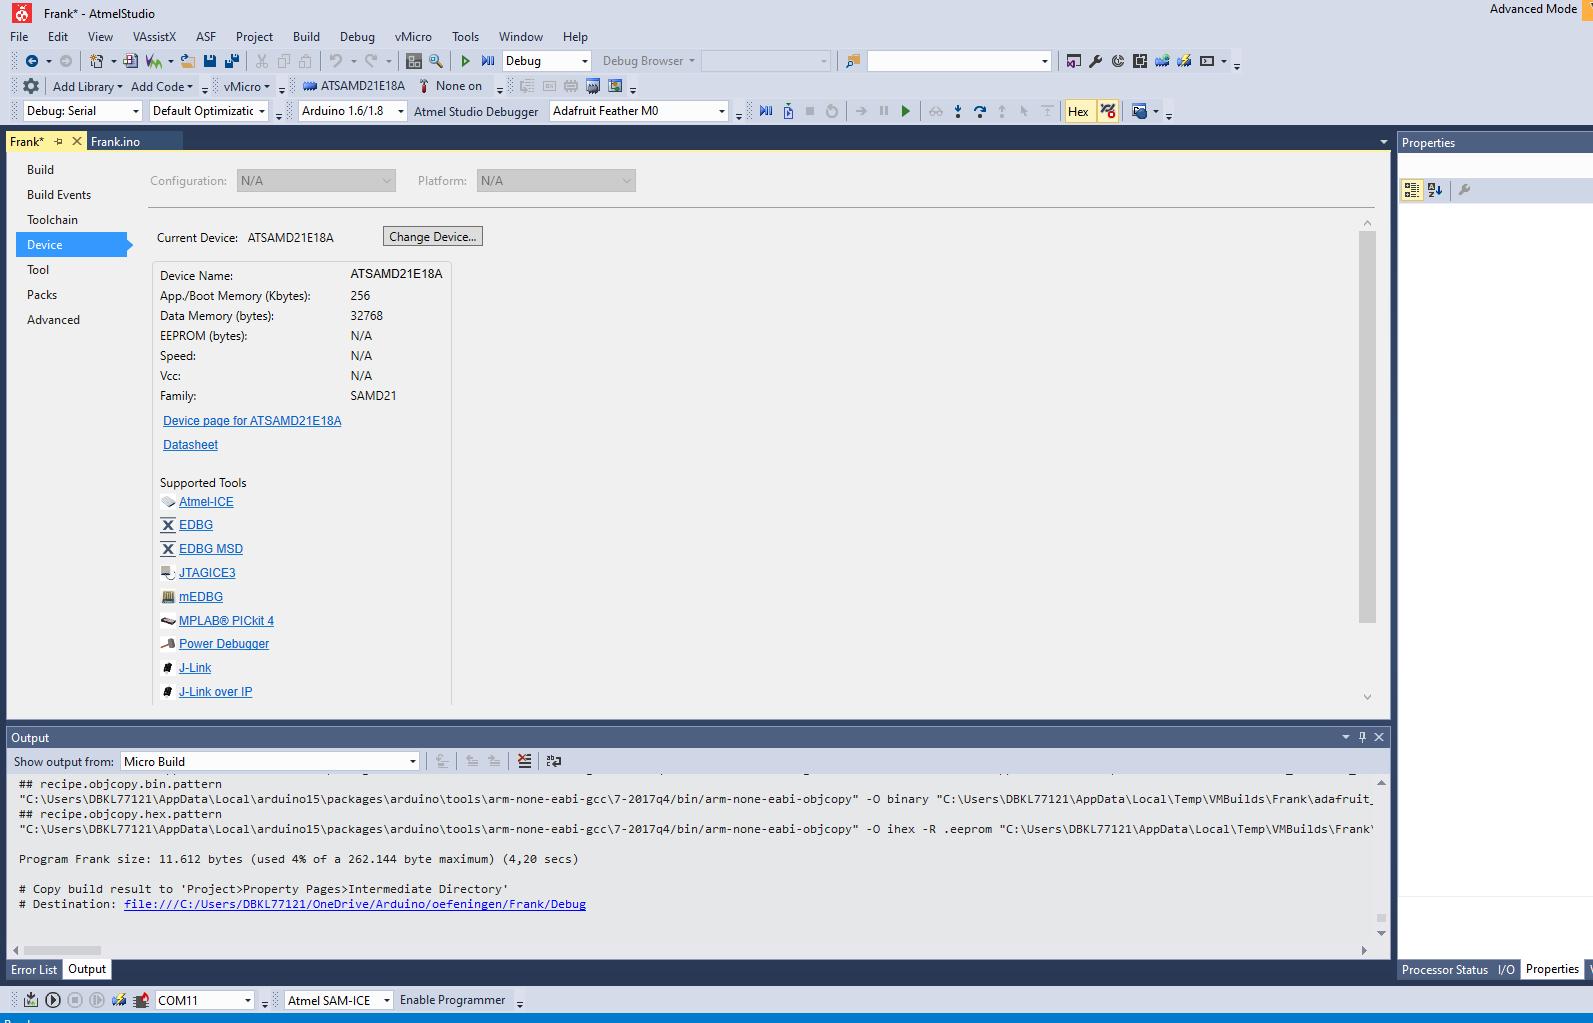 screenshot_002.PNG